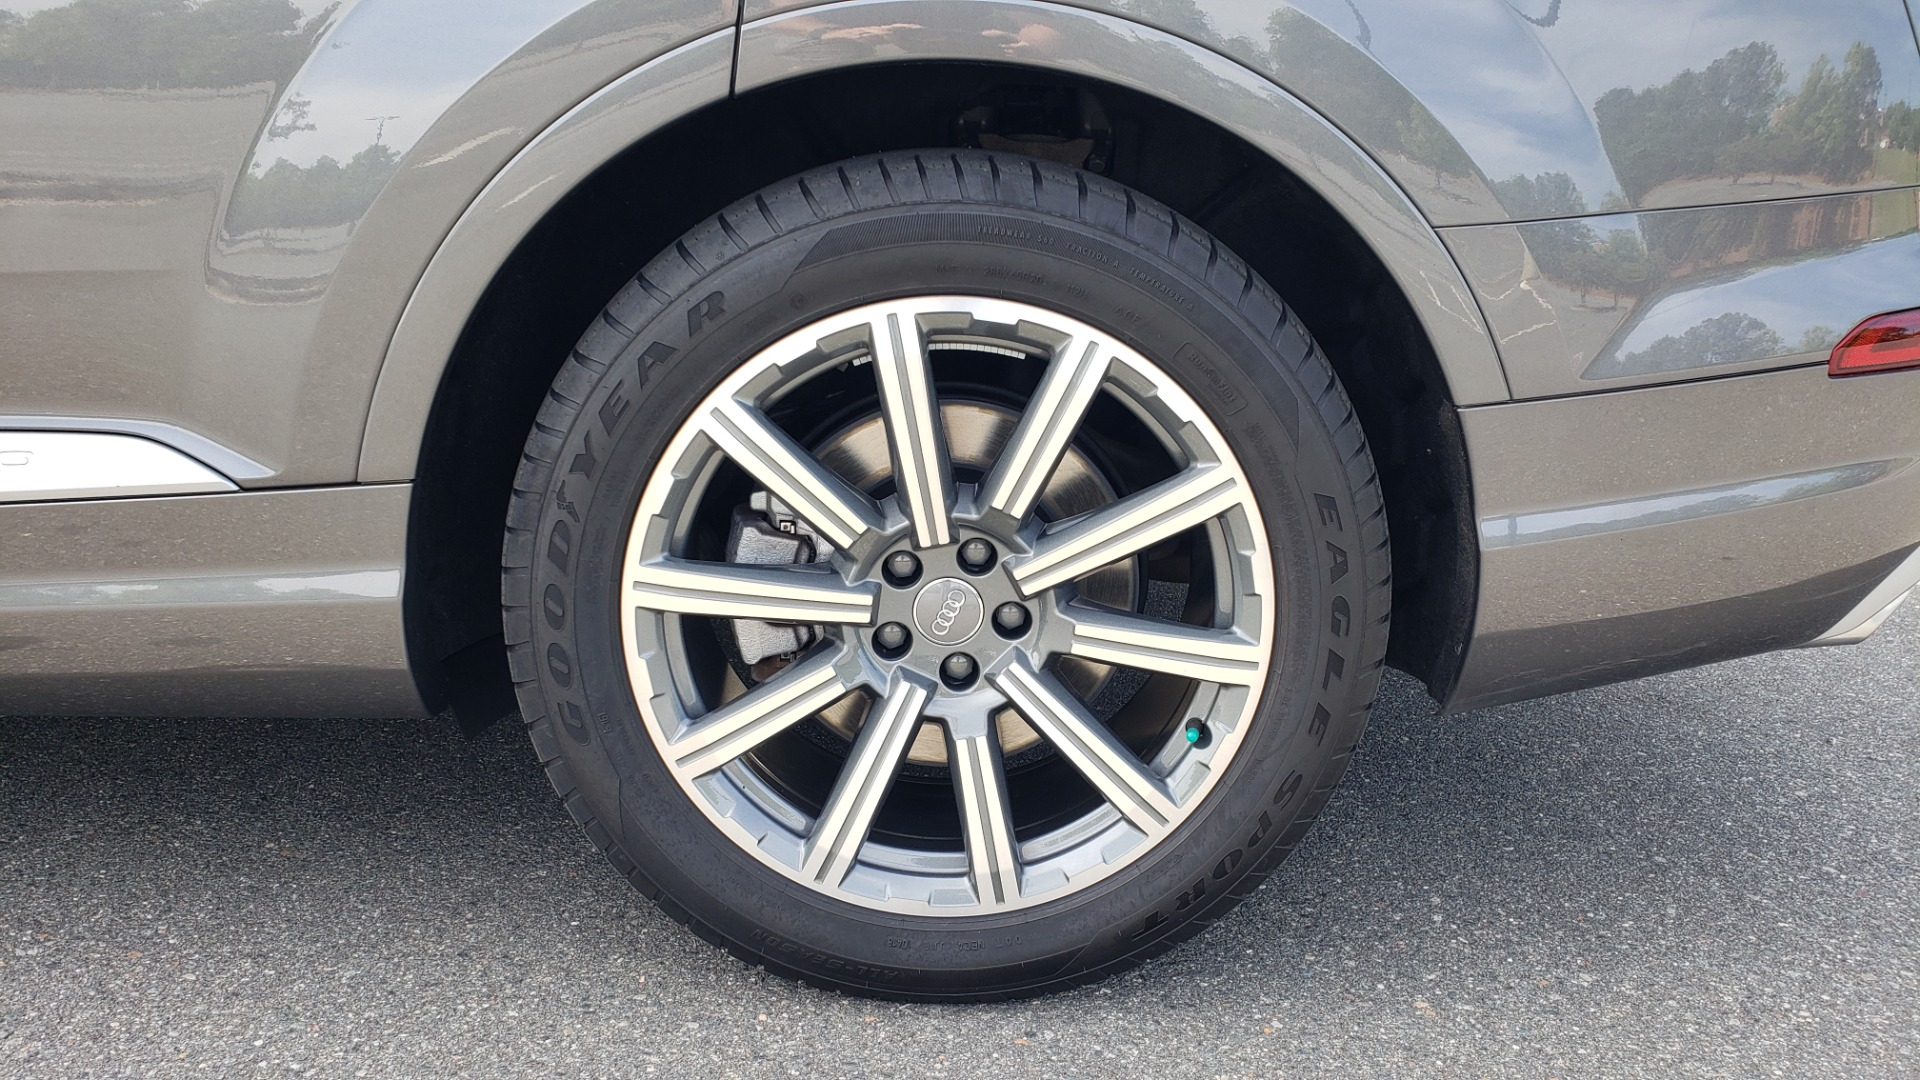 Used 2018 Audi Q7 PRESTIGE TIPTRONIC / NAV / SUNROOF / ADAPTIVE PKG / DRVR ASST / CLD WTHR /  for sale $49,995 at Formula Imports in Charlotte NC 28227 91